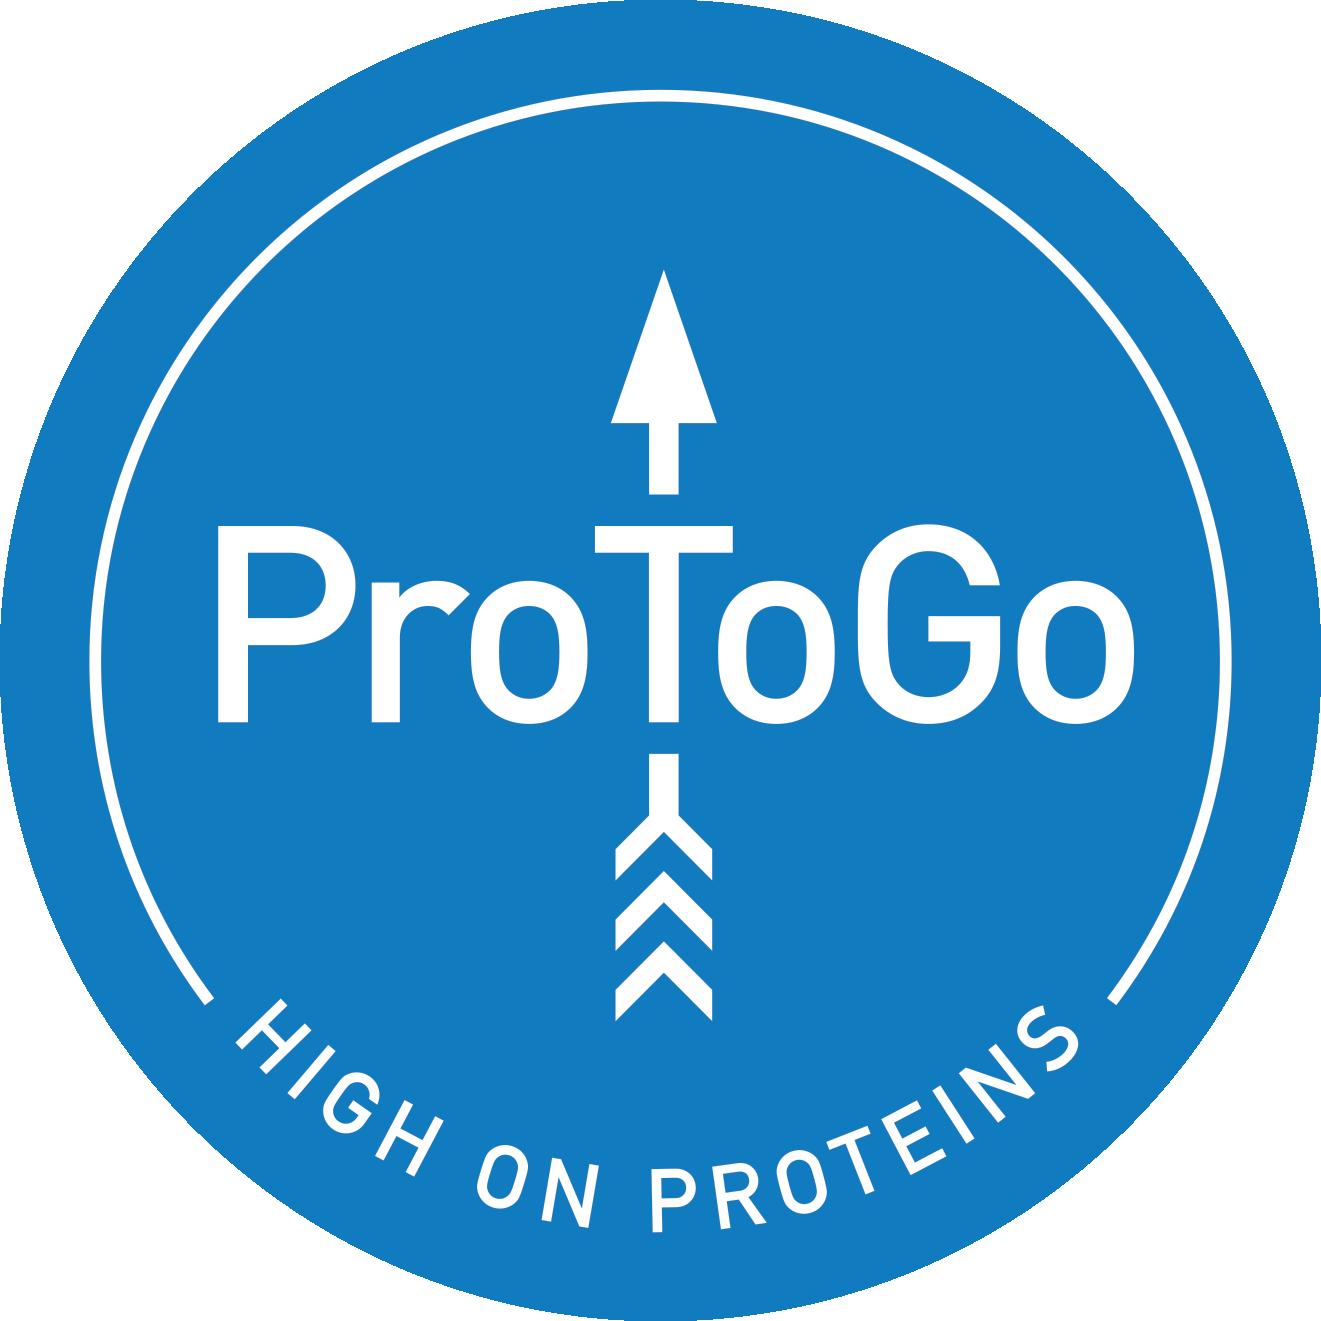 Protogo logo